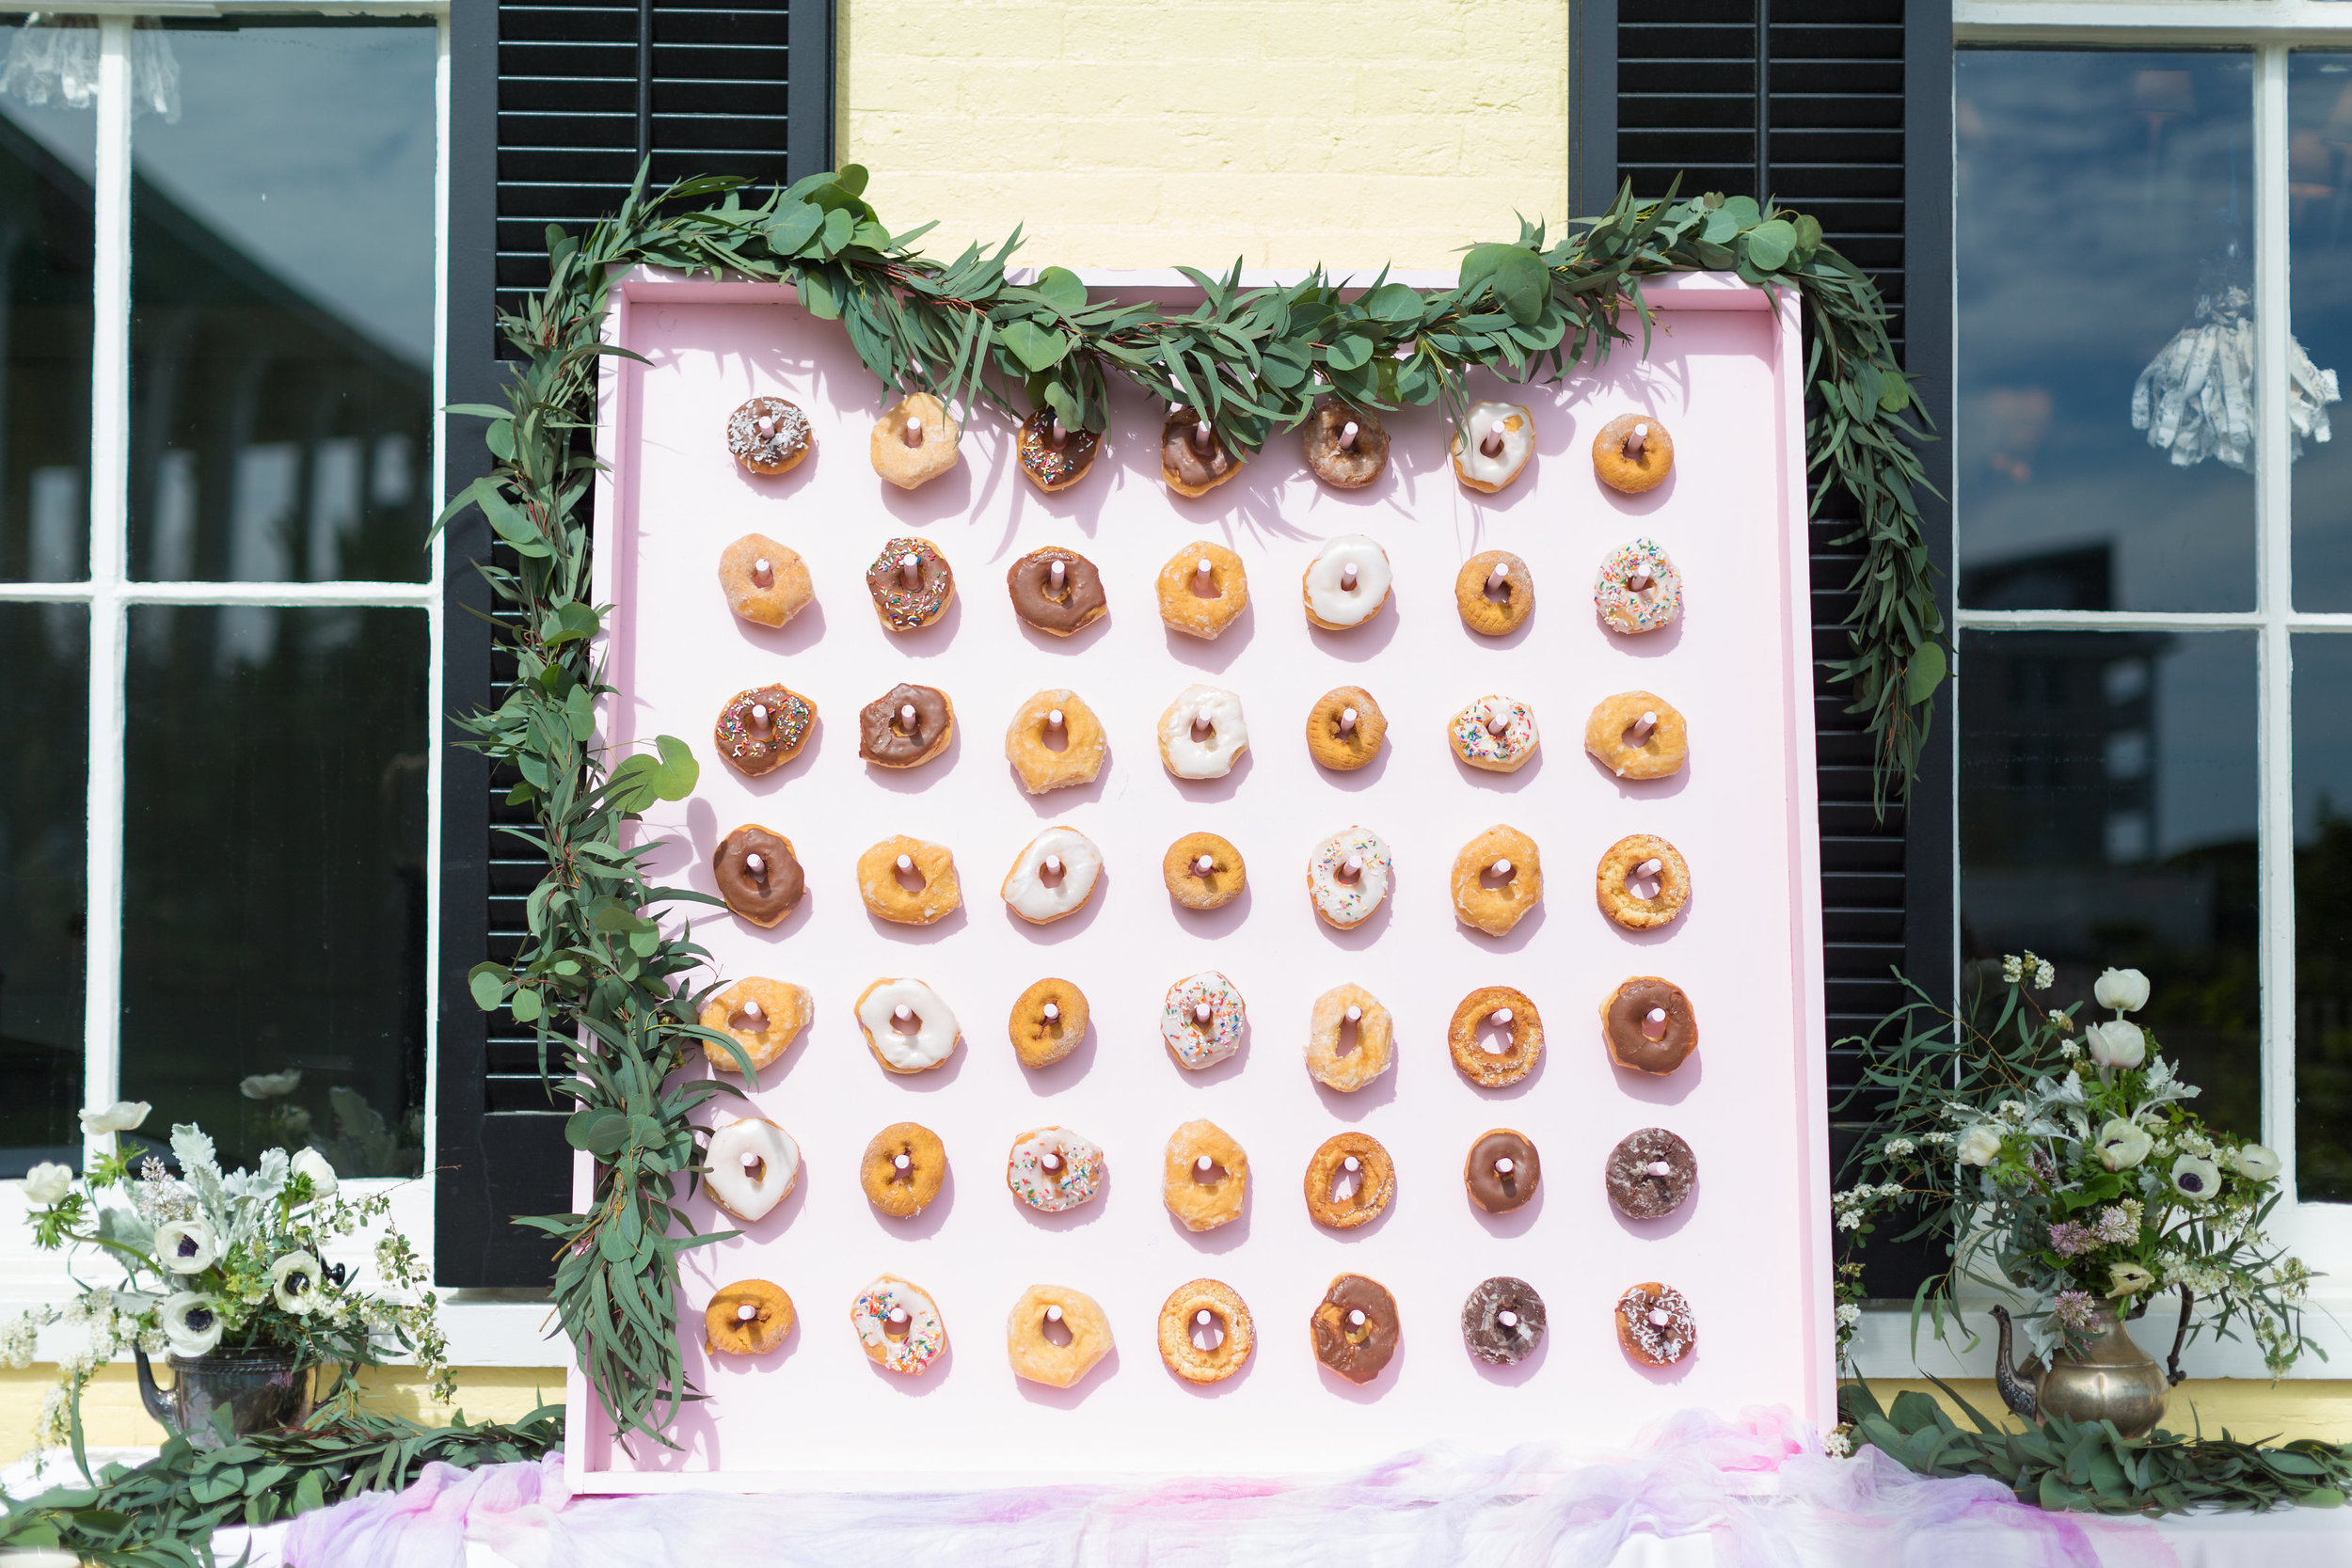 donut wall for Congress Hall photo shoot